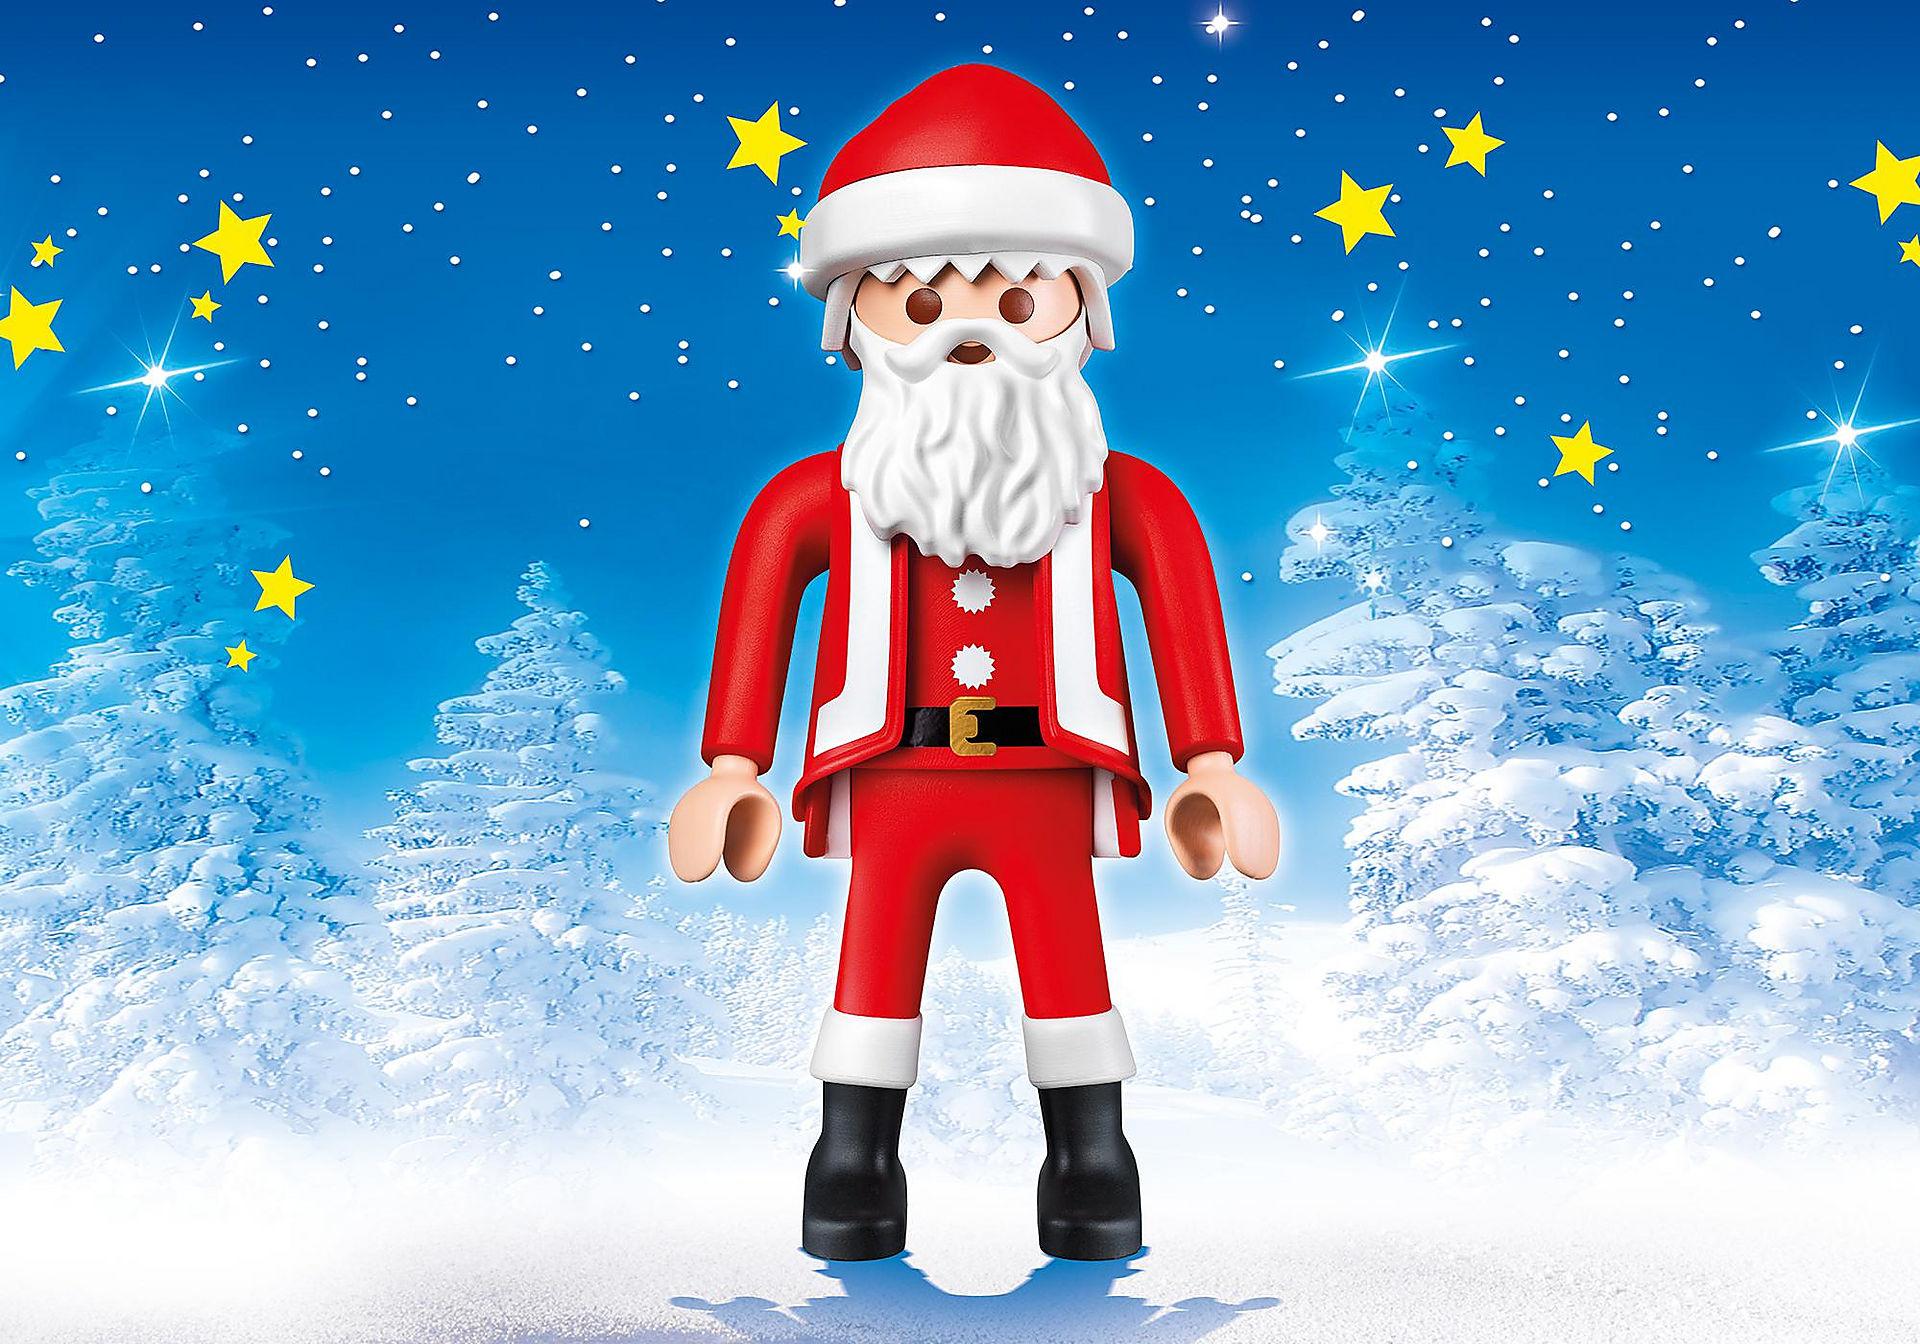 6629 PLAYMOBIL XXL Santa Claus zoom image3